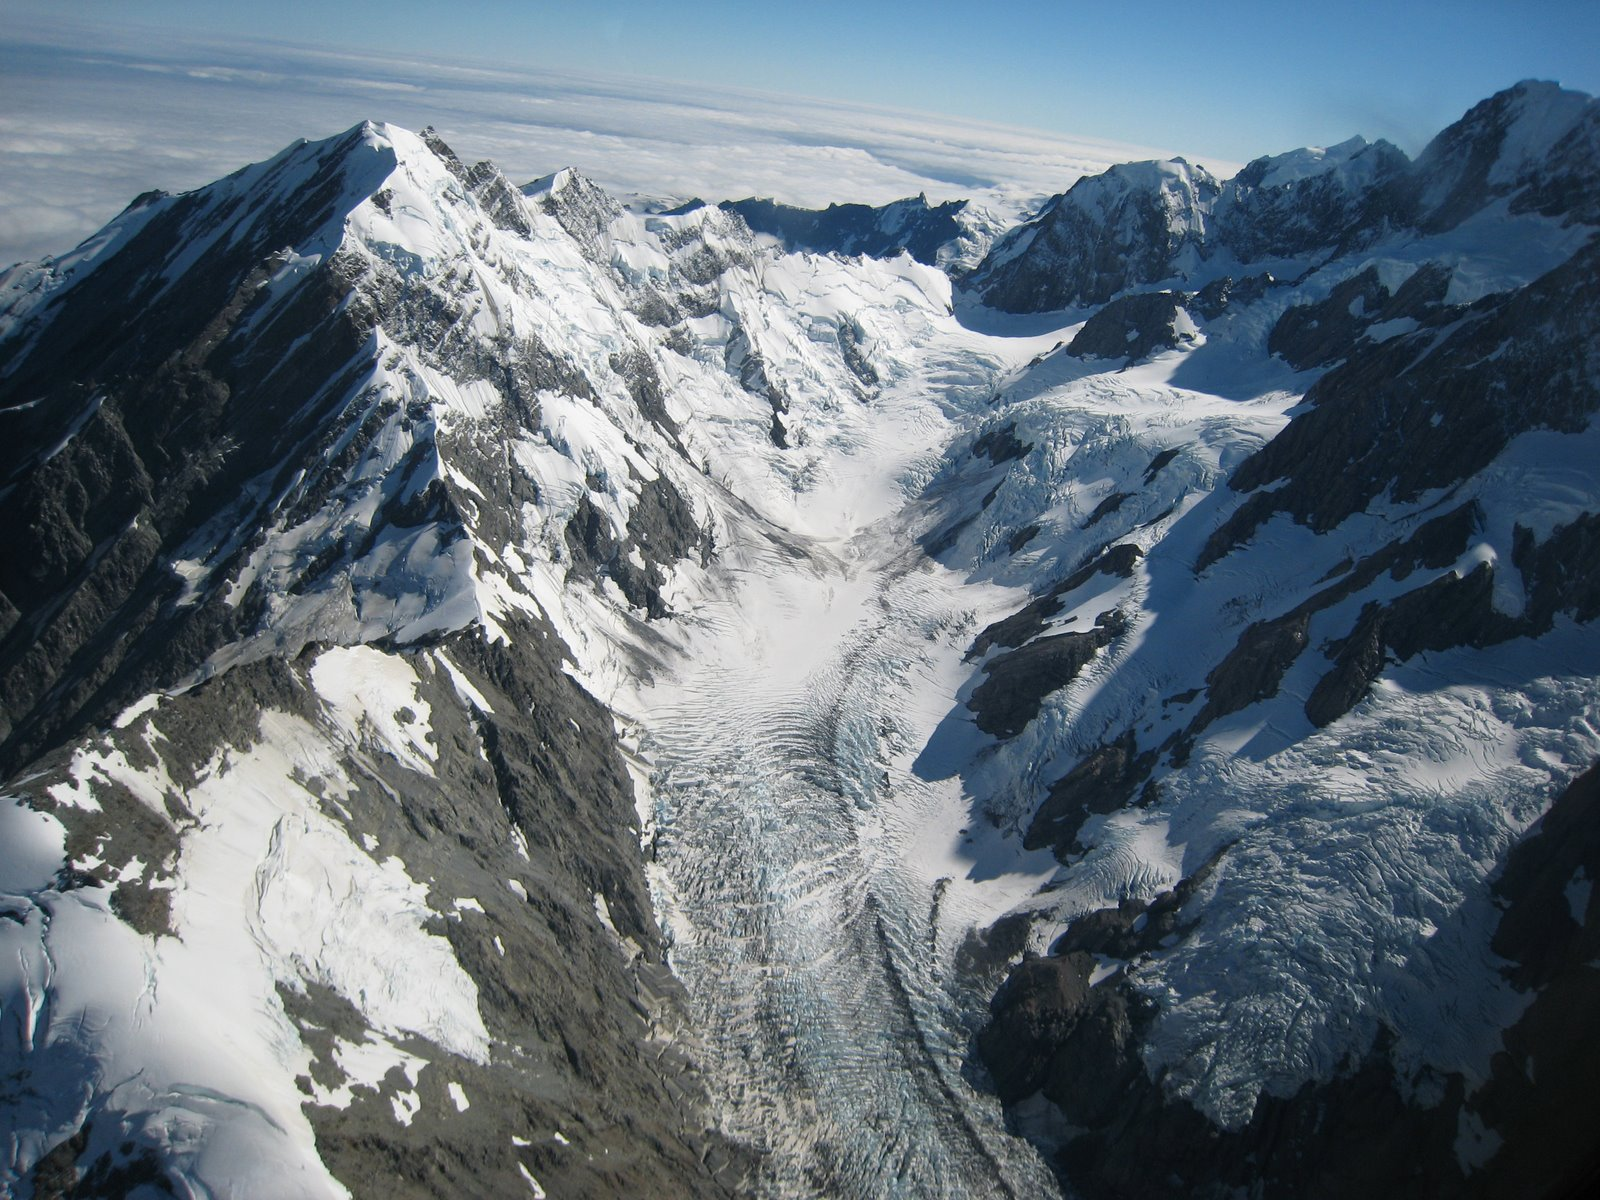 ice erosion pictures - photo #45